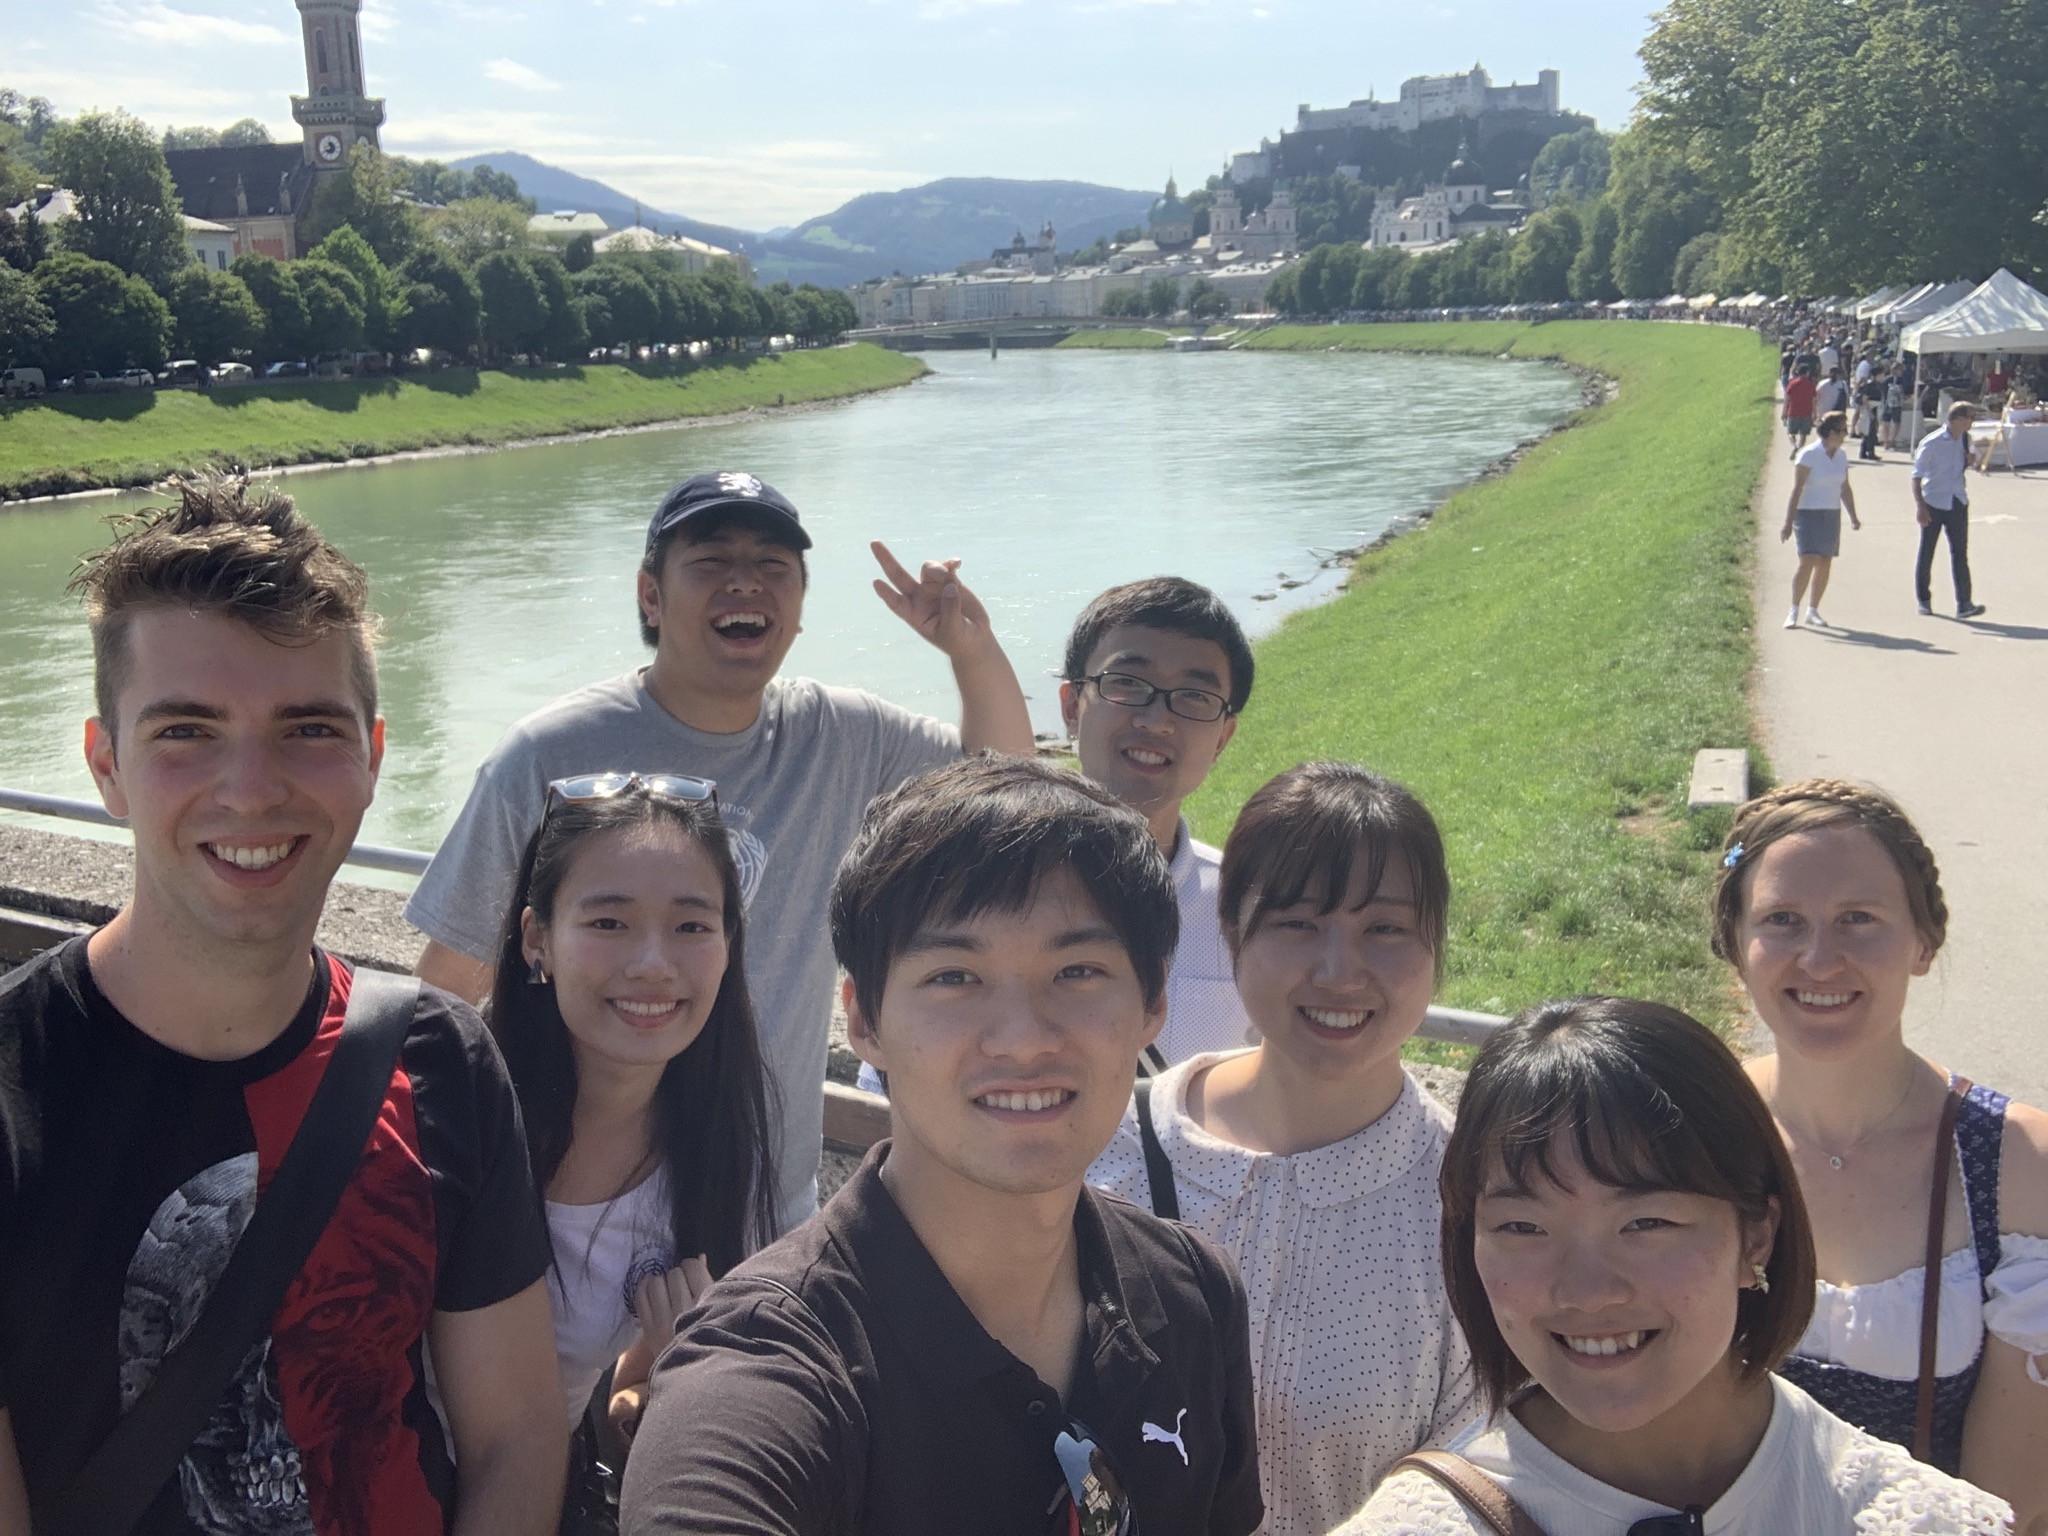 Japanese students visiting Austria in 2019. Photo: Yasuaki Kimoto